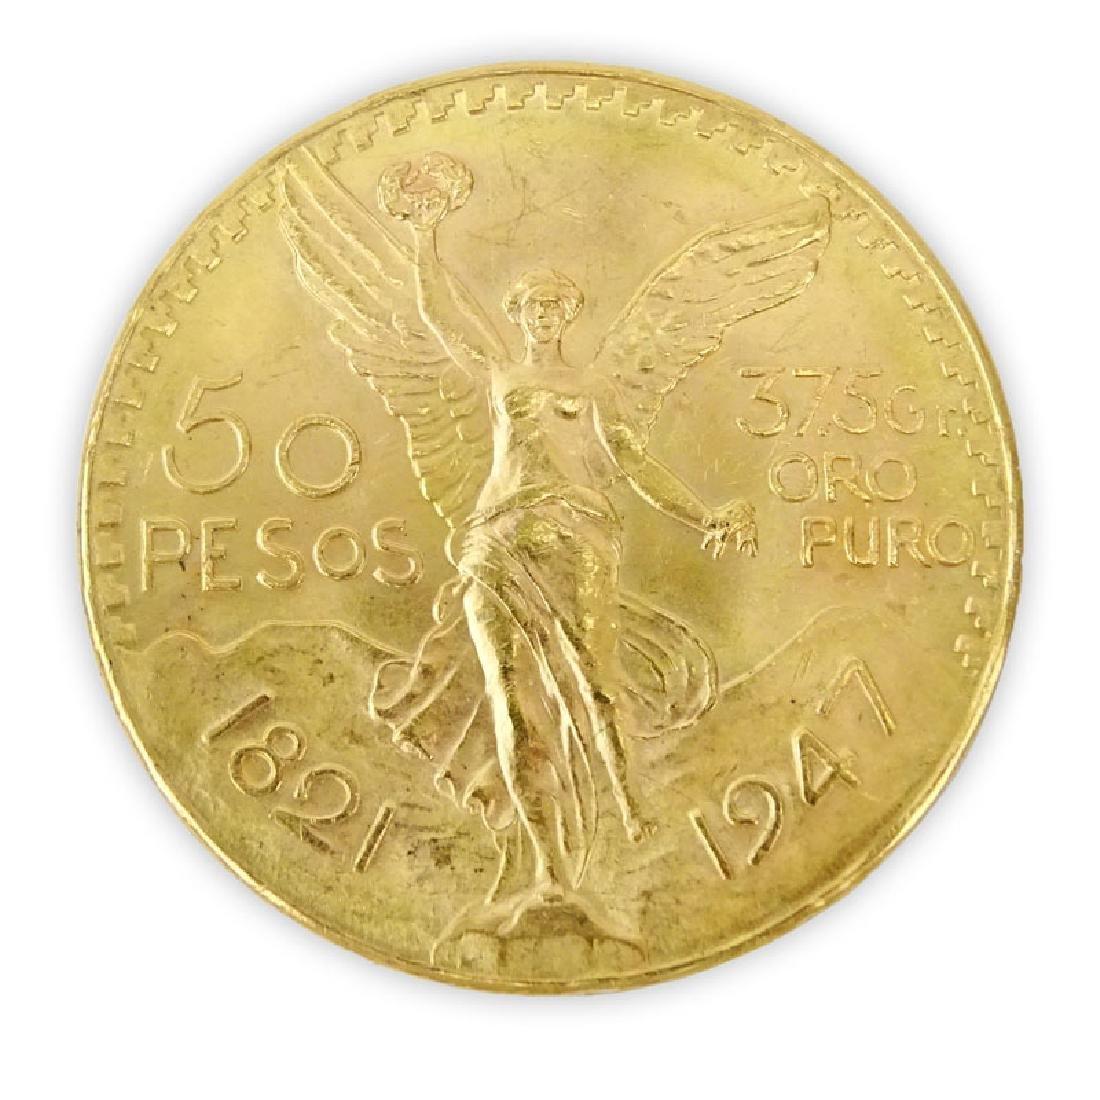 1821-1947 Mexican 50 Pesos Gold Coin. Approx. 41.8